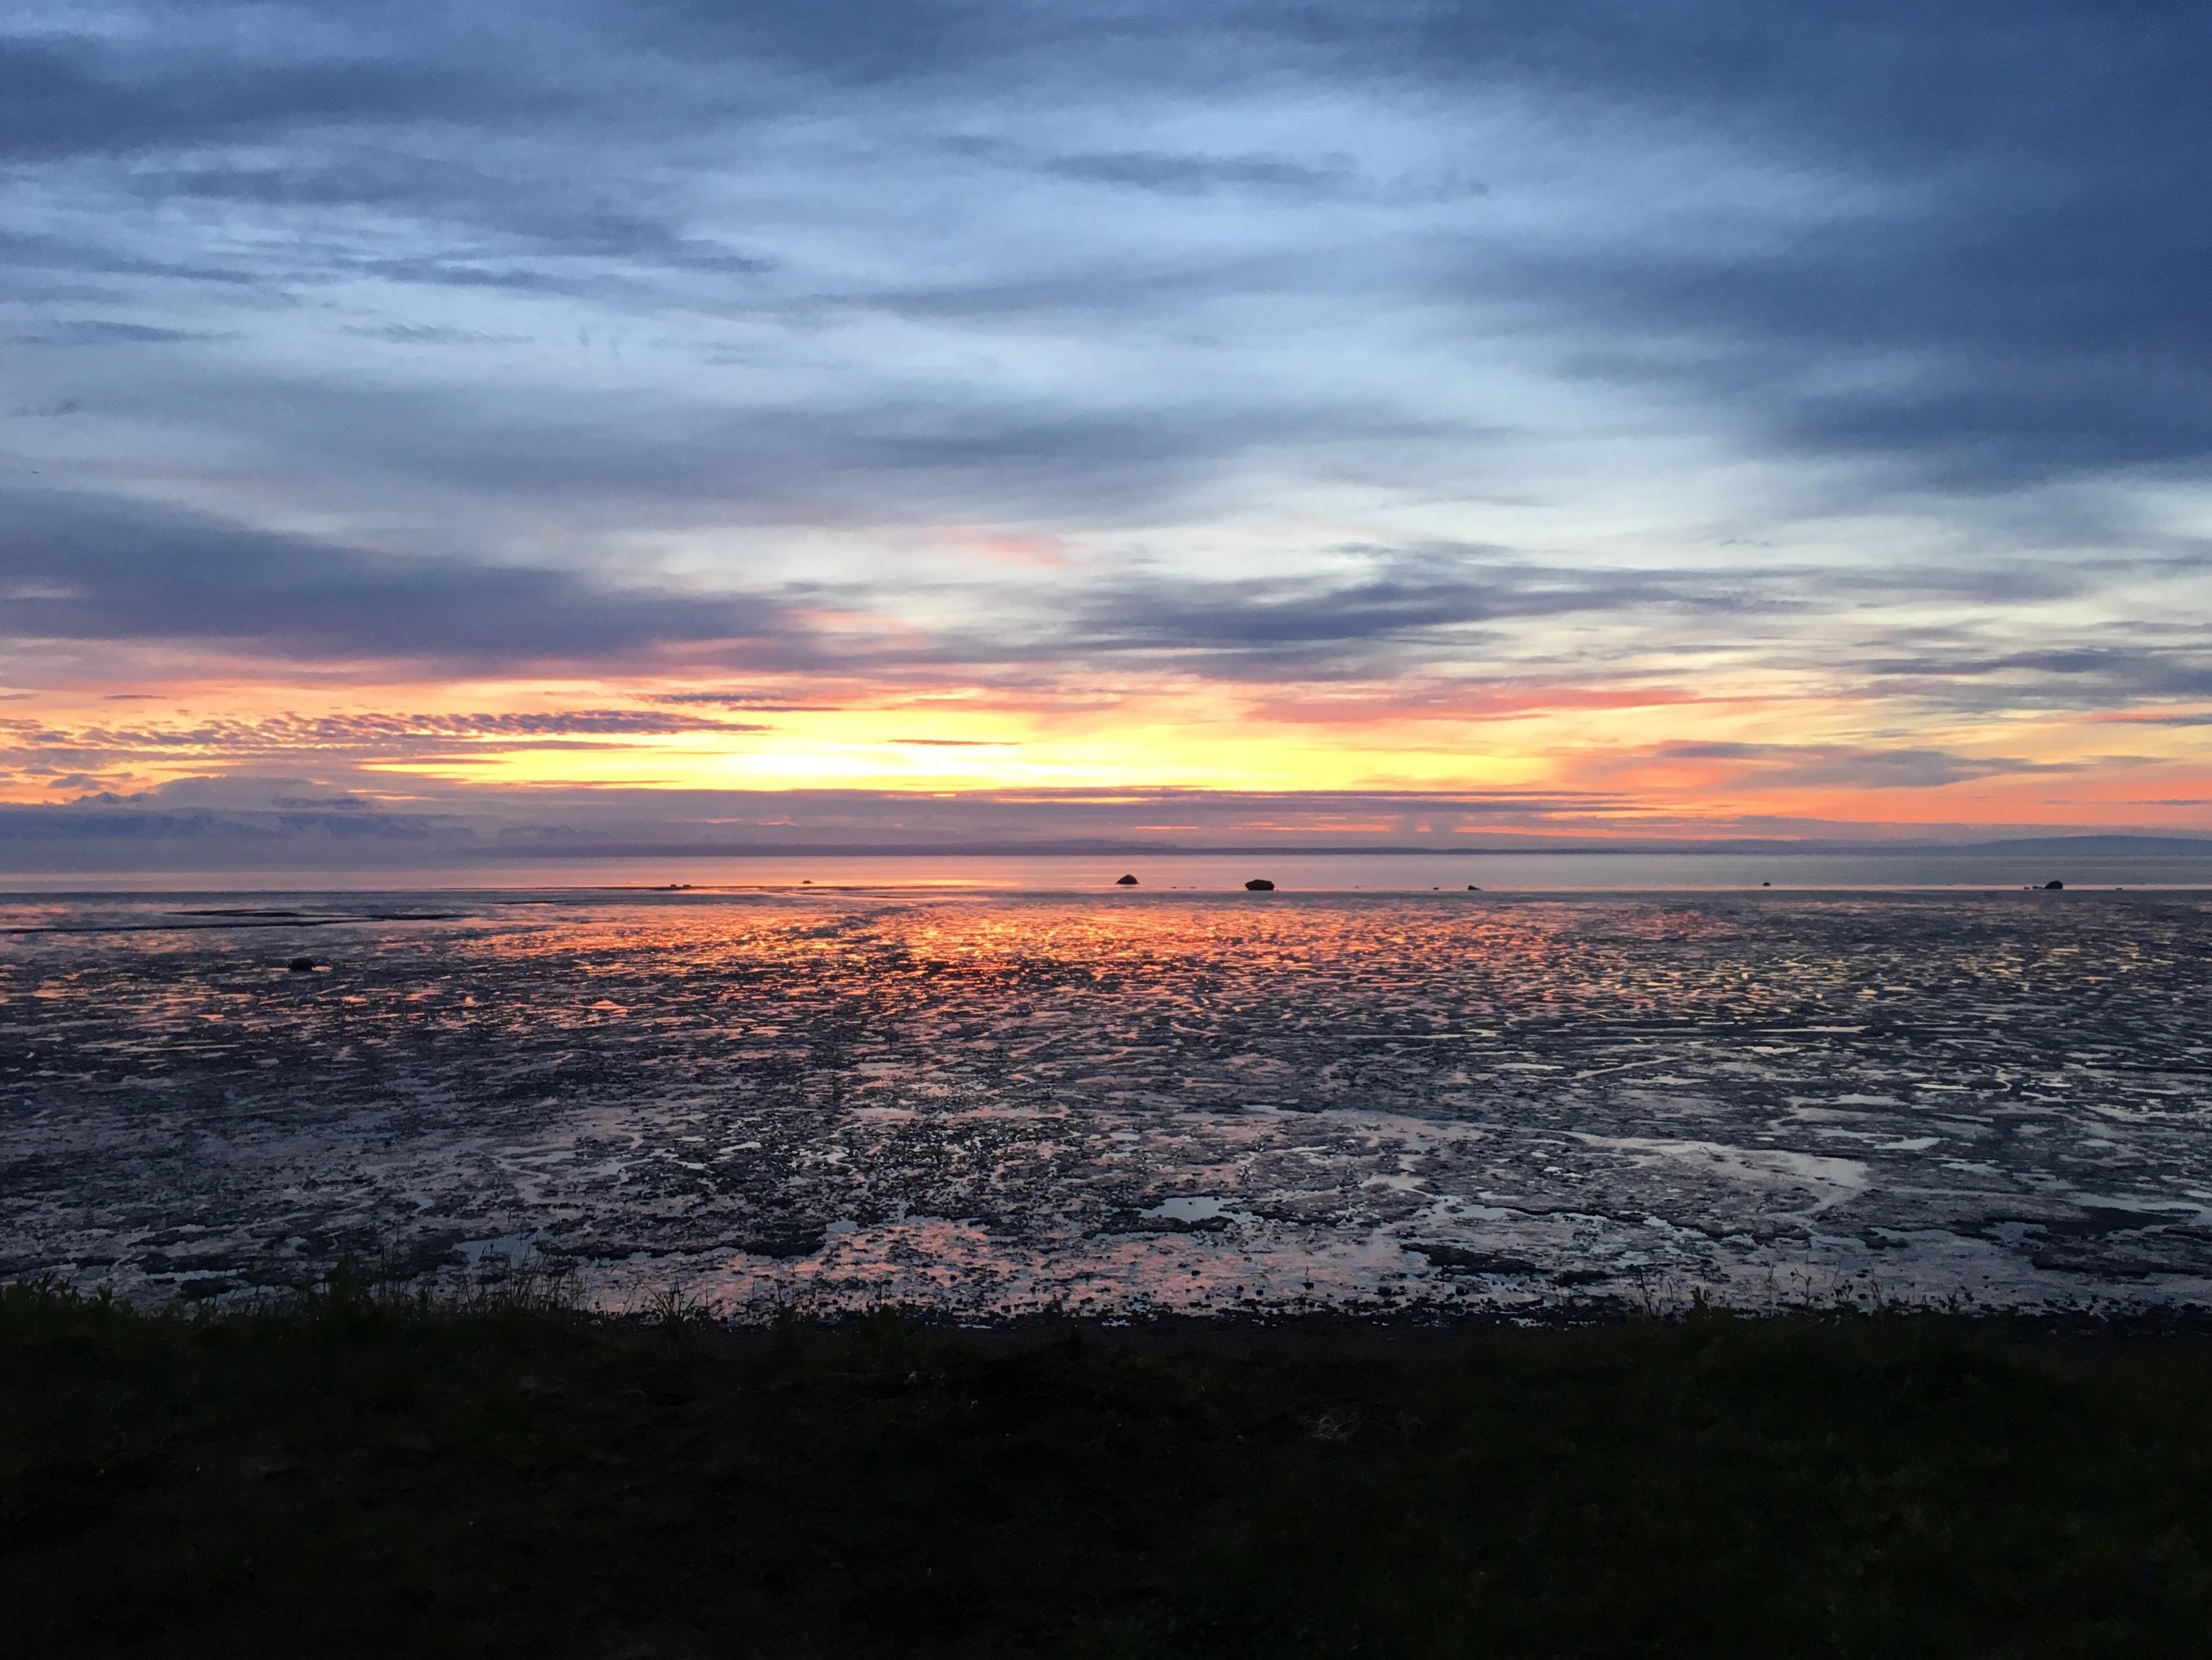 A glimpse of the sun setting over nikiski alaskas gorgeous mud flats